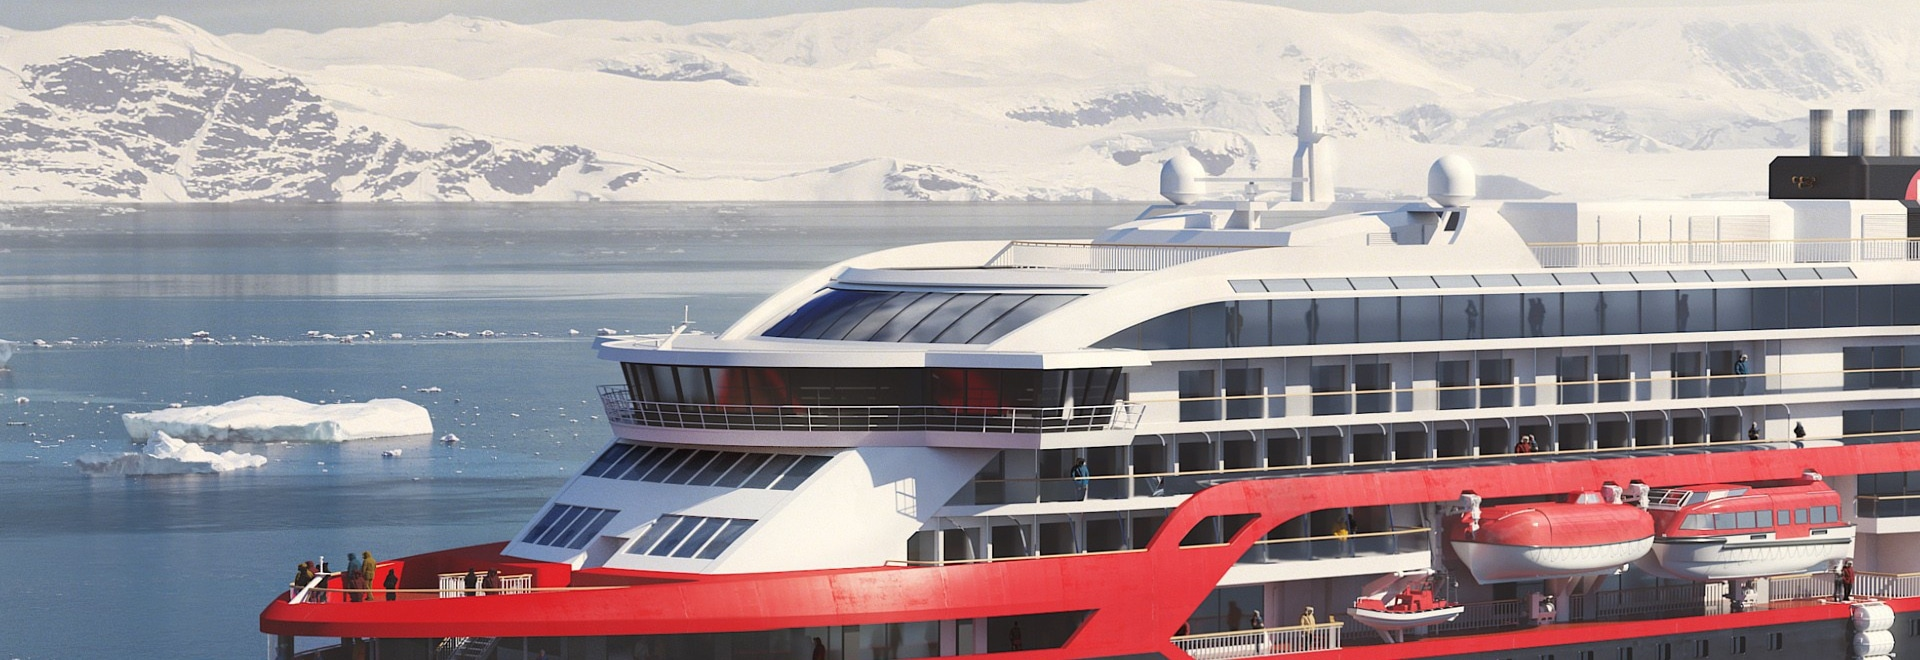 Hurtigruten launches new hybrid cruise ship